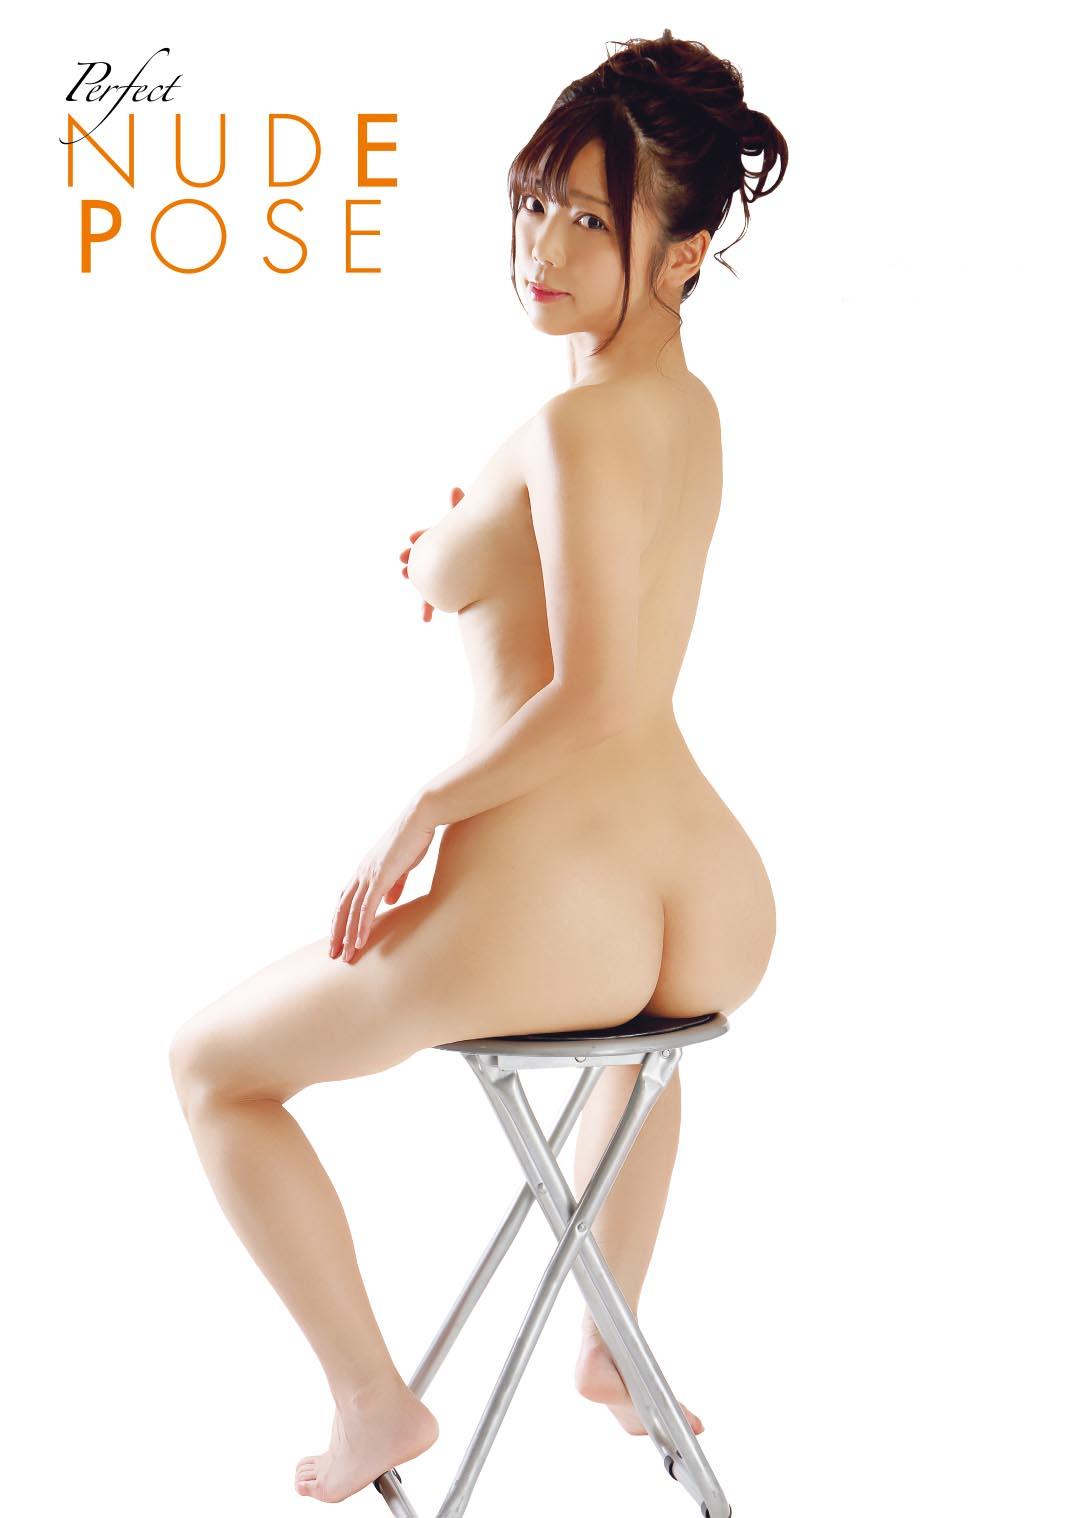 All Nude 羽 咲 みはる 本日発売!!】羽咲みはるちゃんの美ボディが隅々まで堪能でき